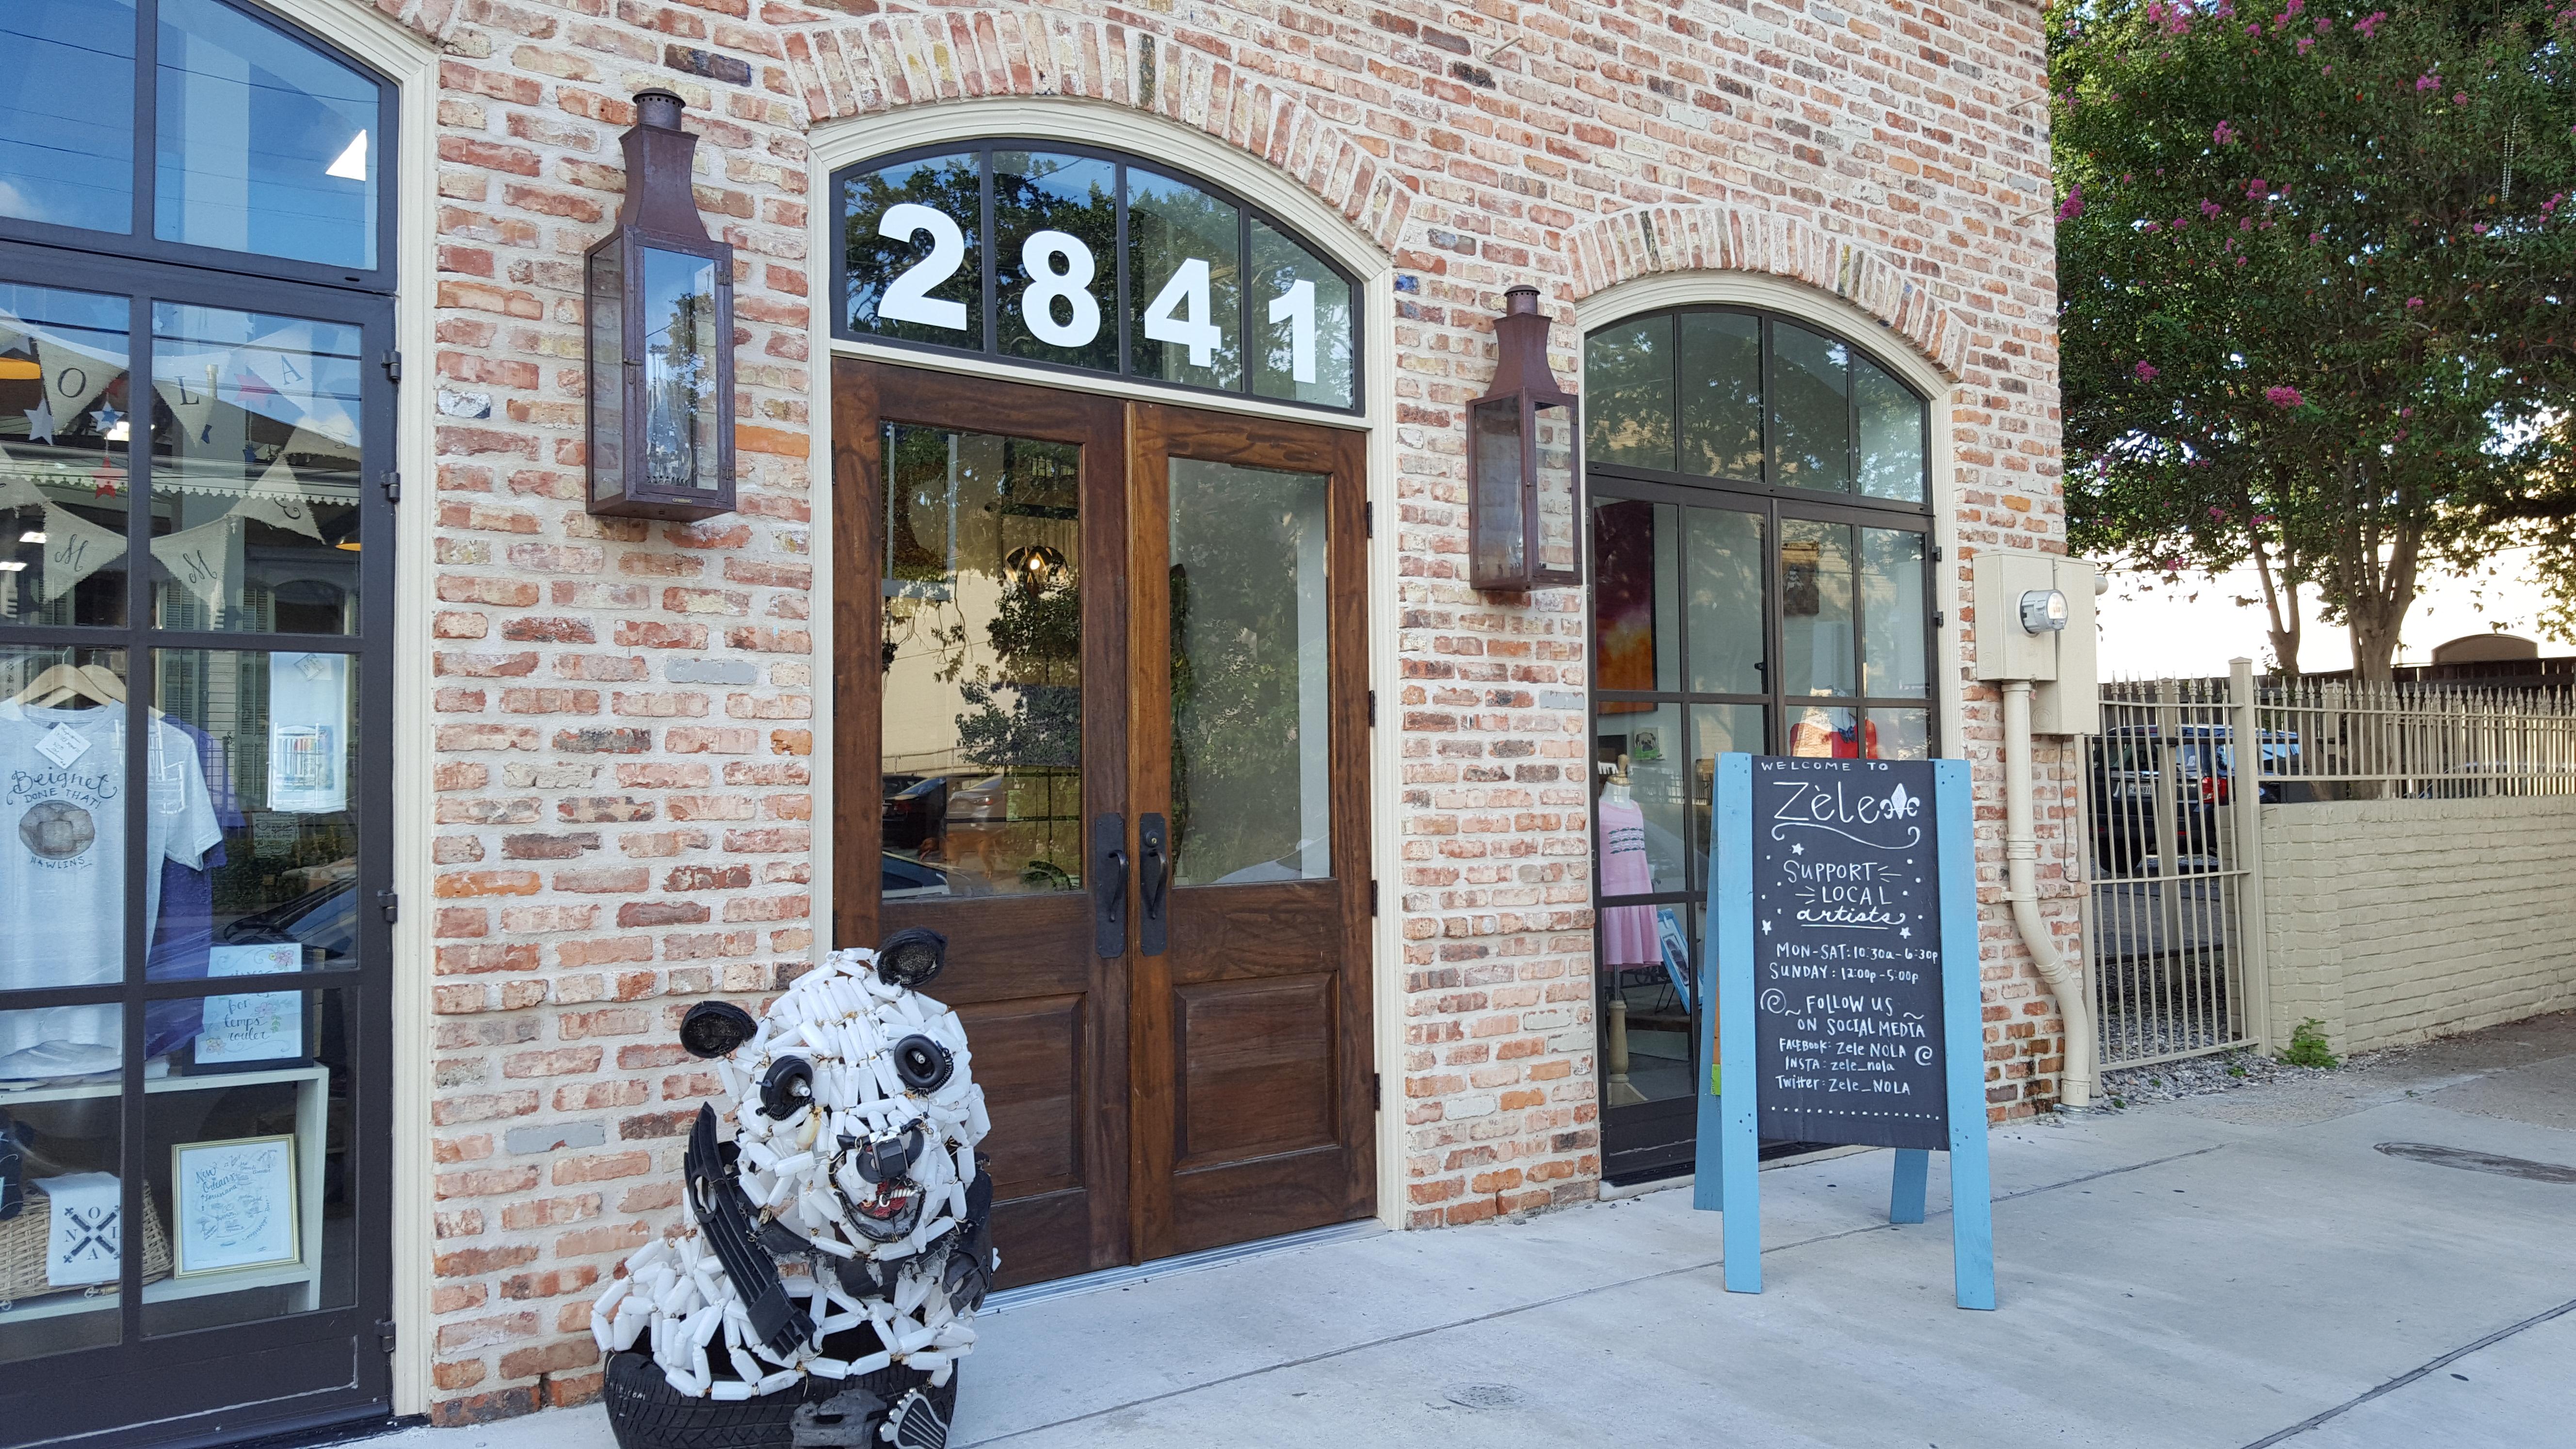 Magazine Street, the block between Community Coffee and Starbucks.